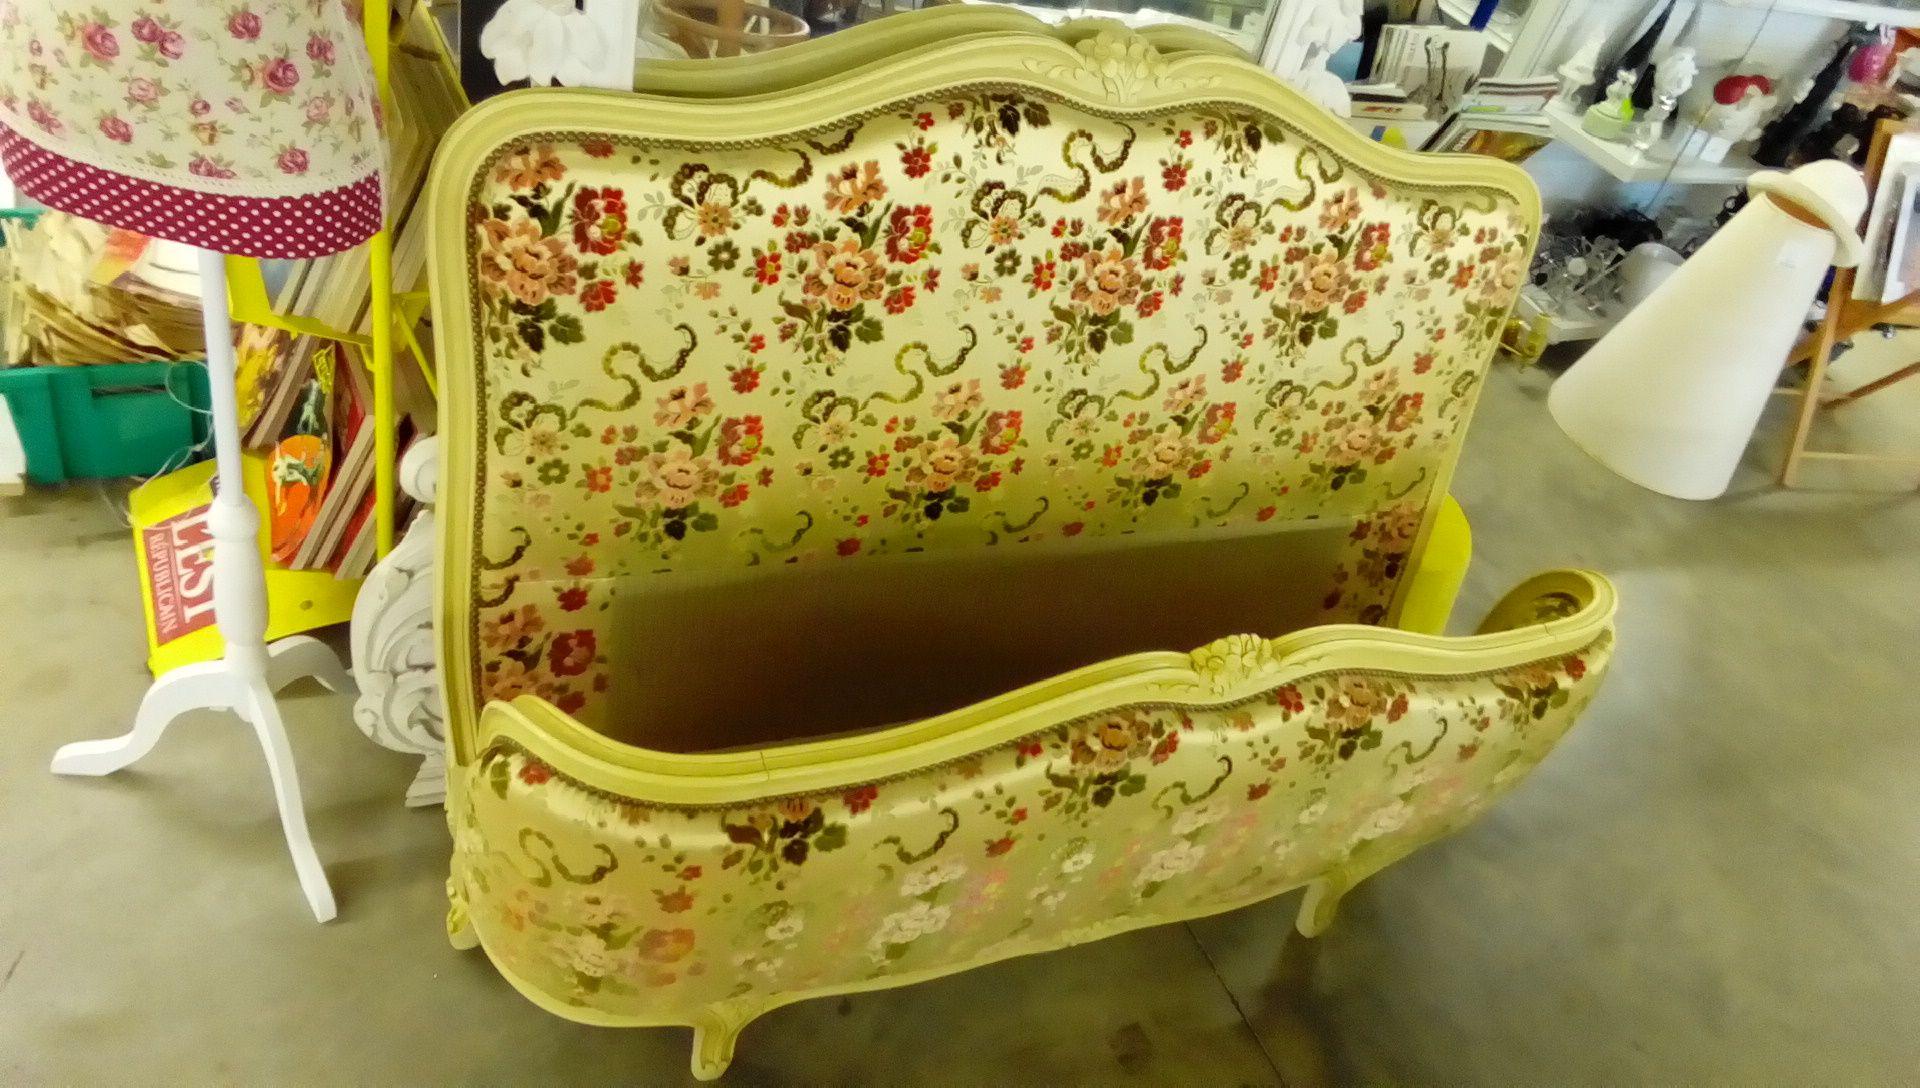 lit style louis xv 1 2 corbeille occasion troc nancy. Black Bedroom Furniture Sets. Home Design Ideas